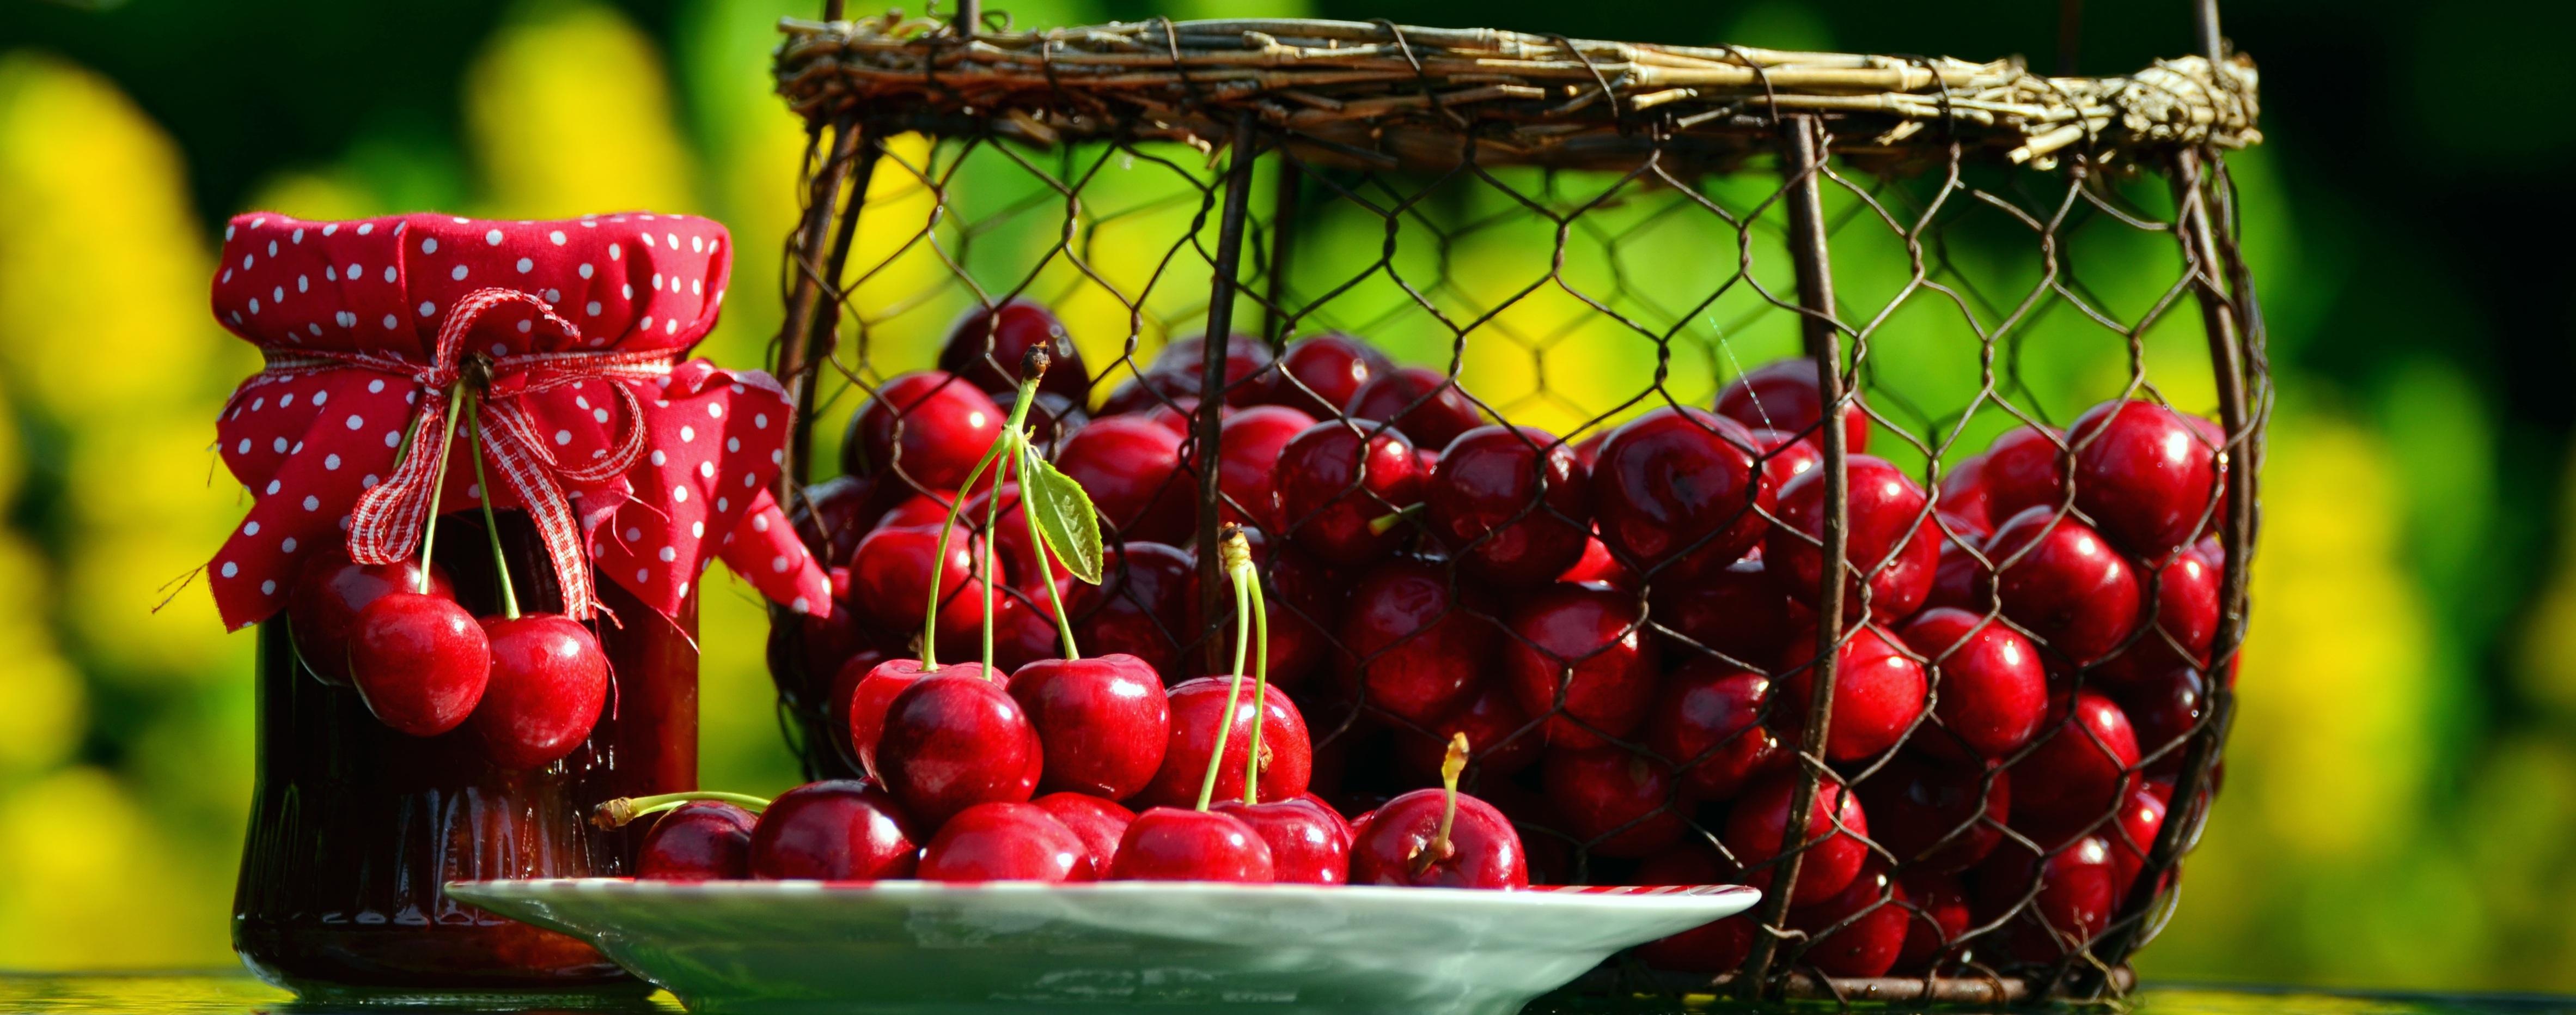 cherries-1513949.jpg